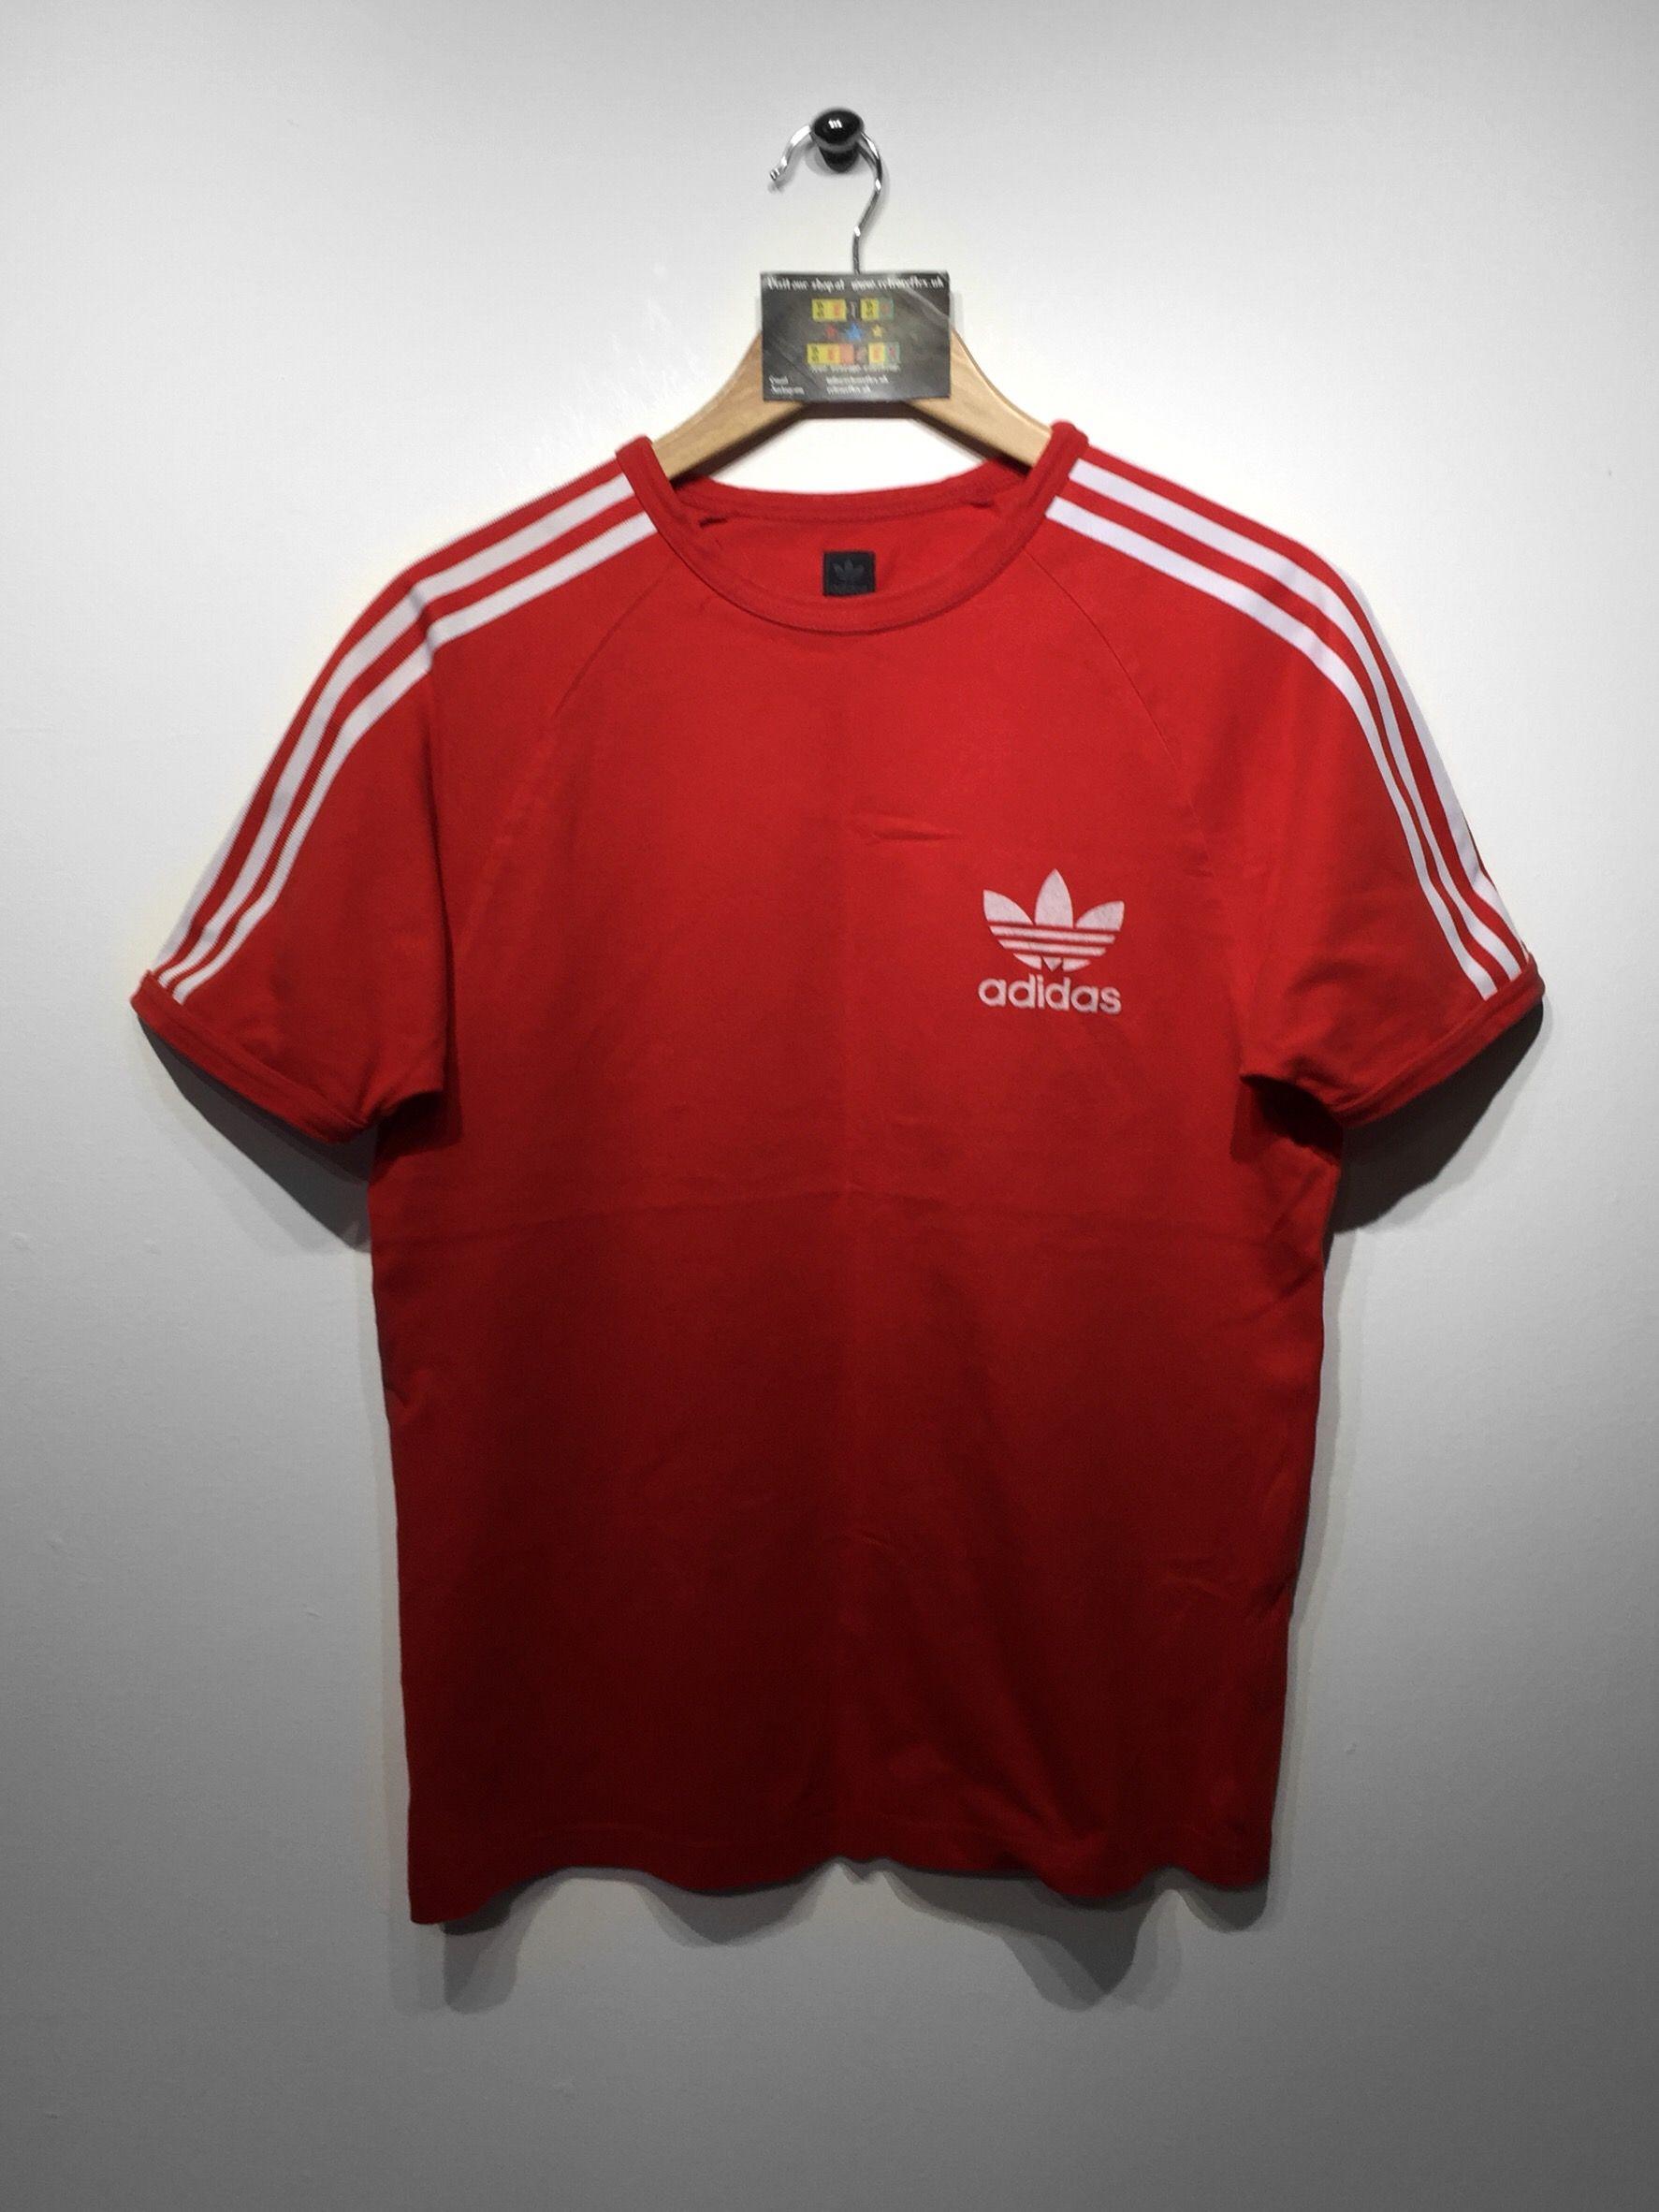 Www T Smallbut Fits Size Website➡️ Shirt Adidas Oversized£18 wOnkP80X